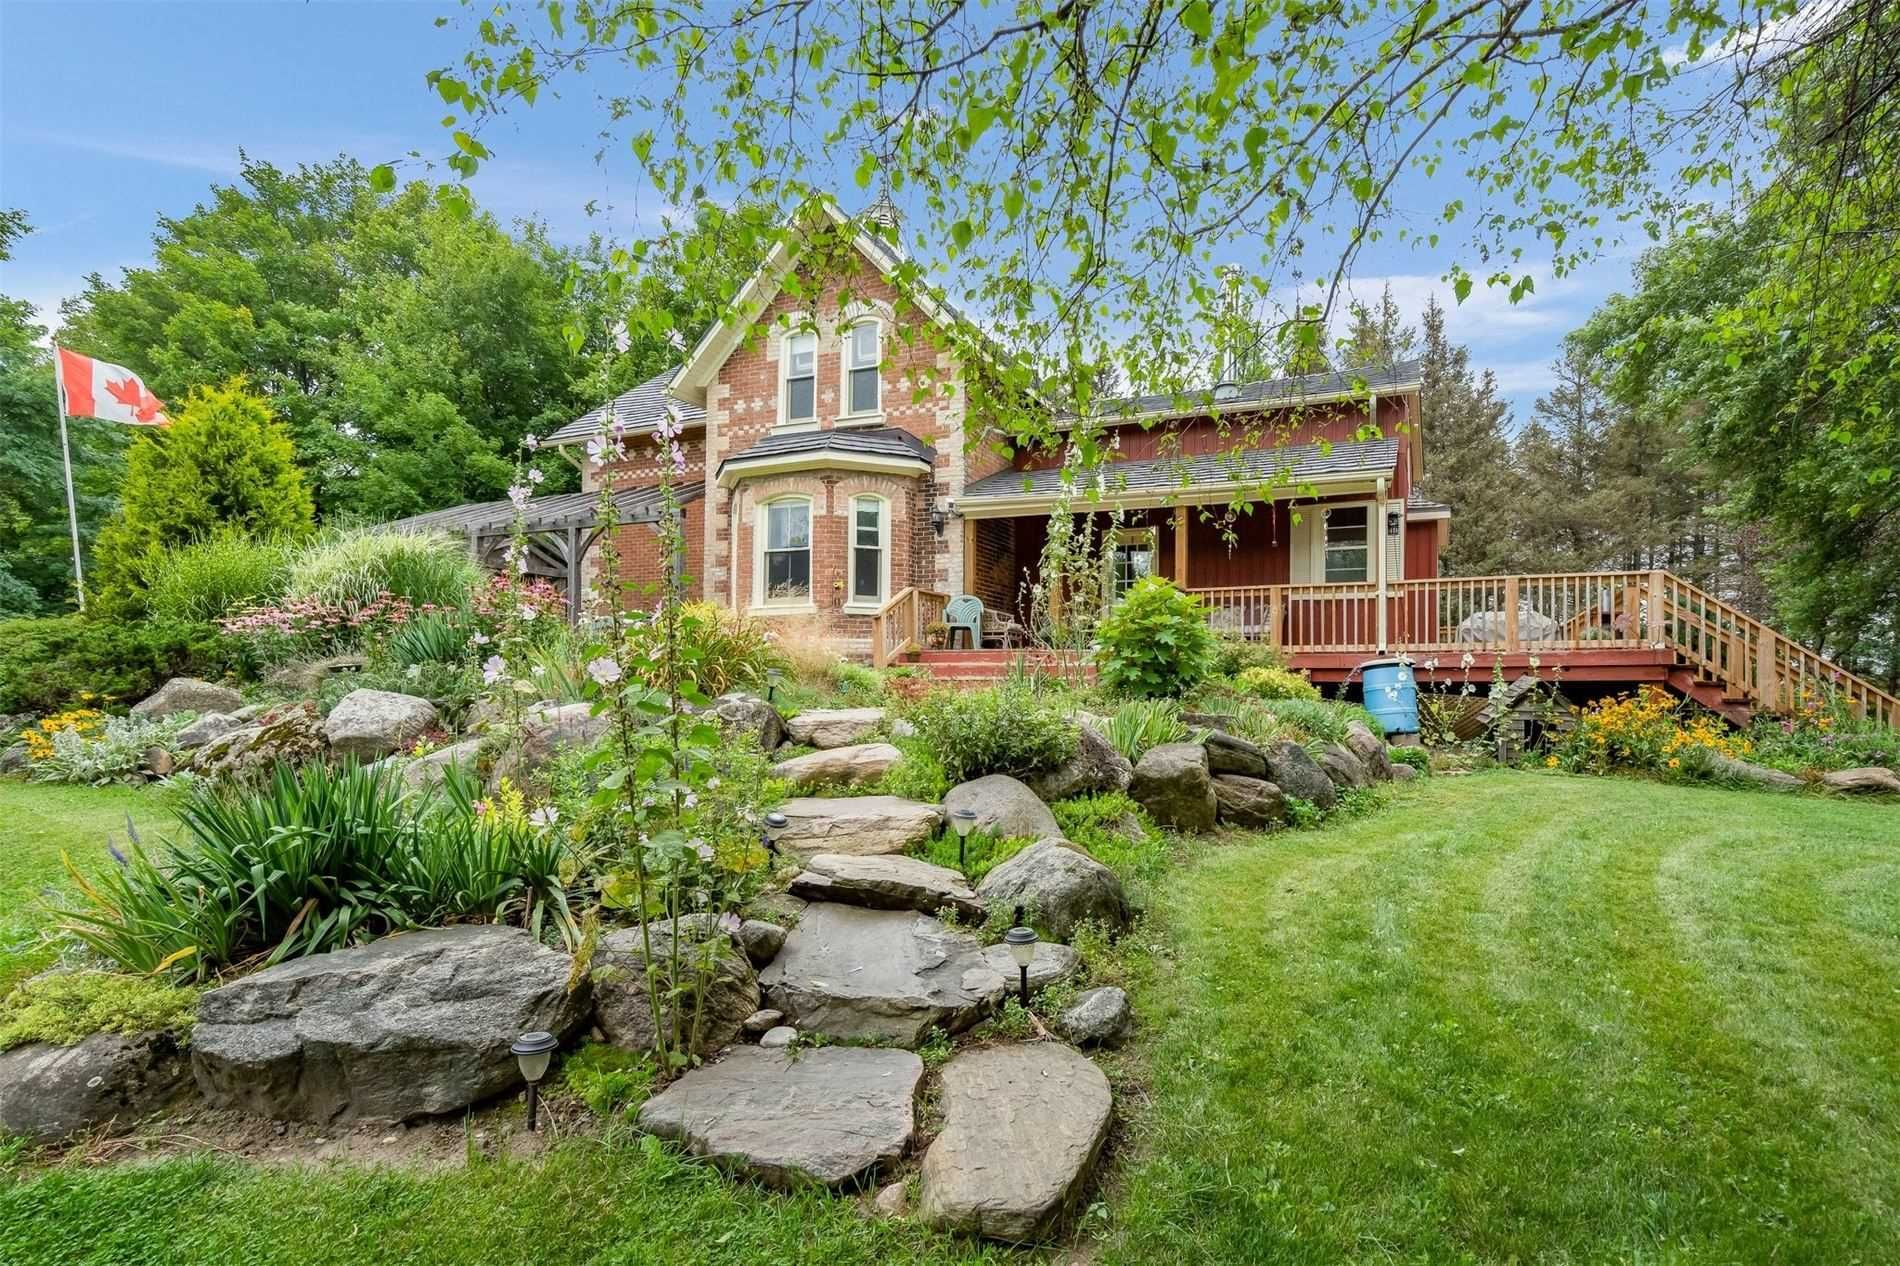 Main Photo: 796149 E 3rd Line in Mulmur: Rural Mulmur House (2-Storey) for sale : MLS®# X5340569